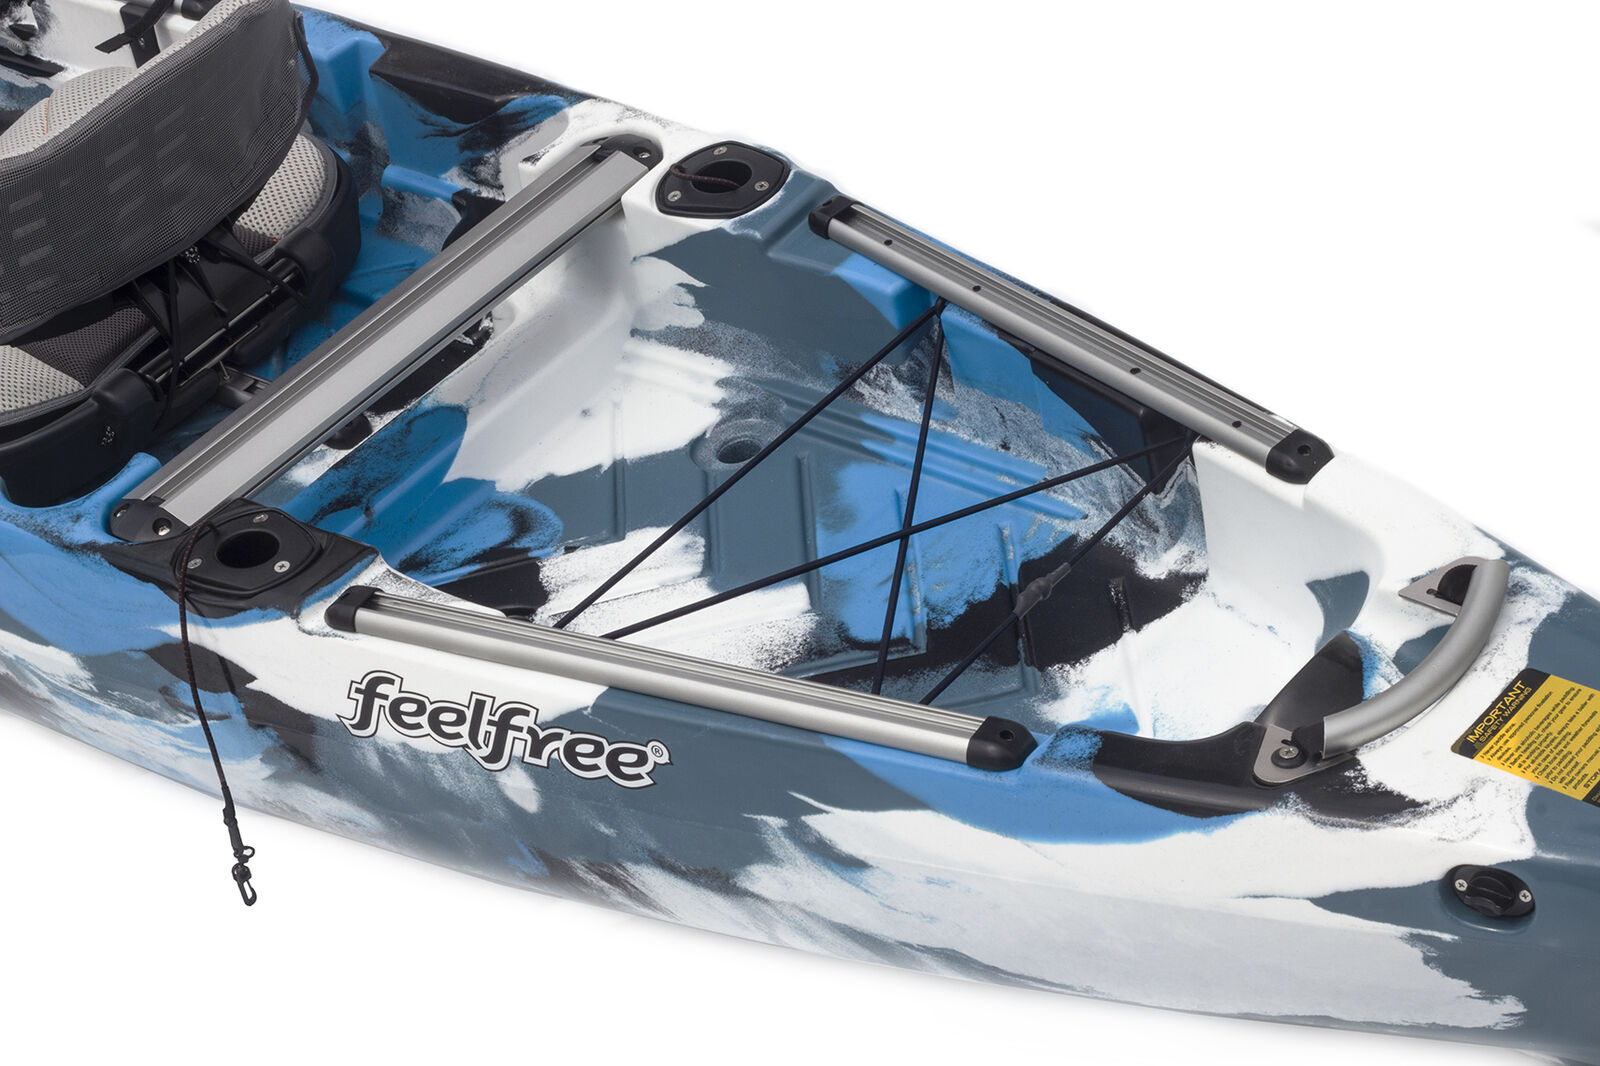 Feelfree Dagon 14 Angelkajak fishing kayak AngelStiefel Angler Kajak Kajak Kajak zum angeln c3f8cf